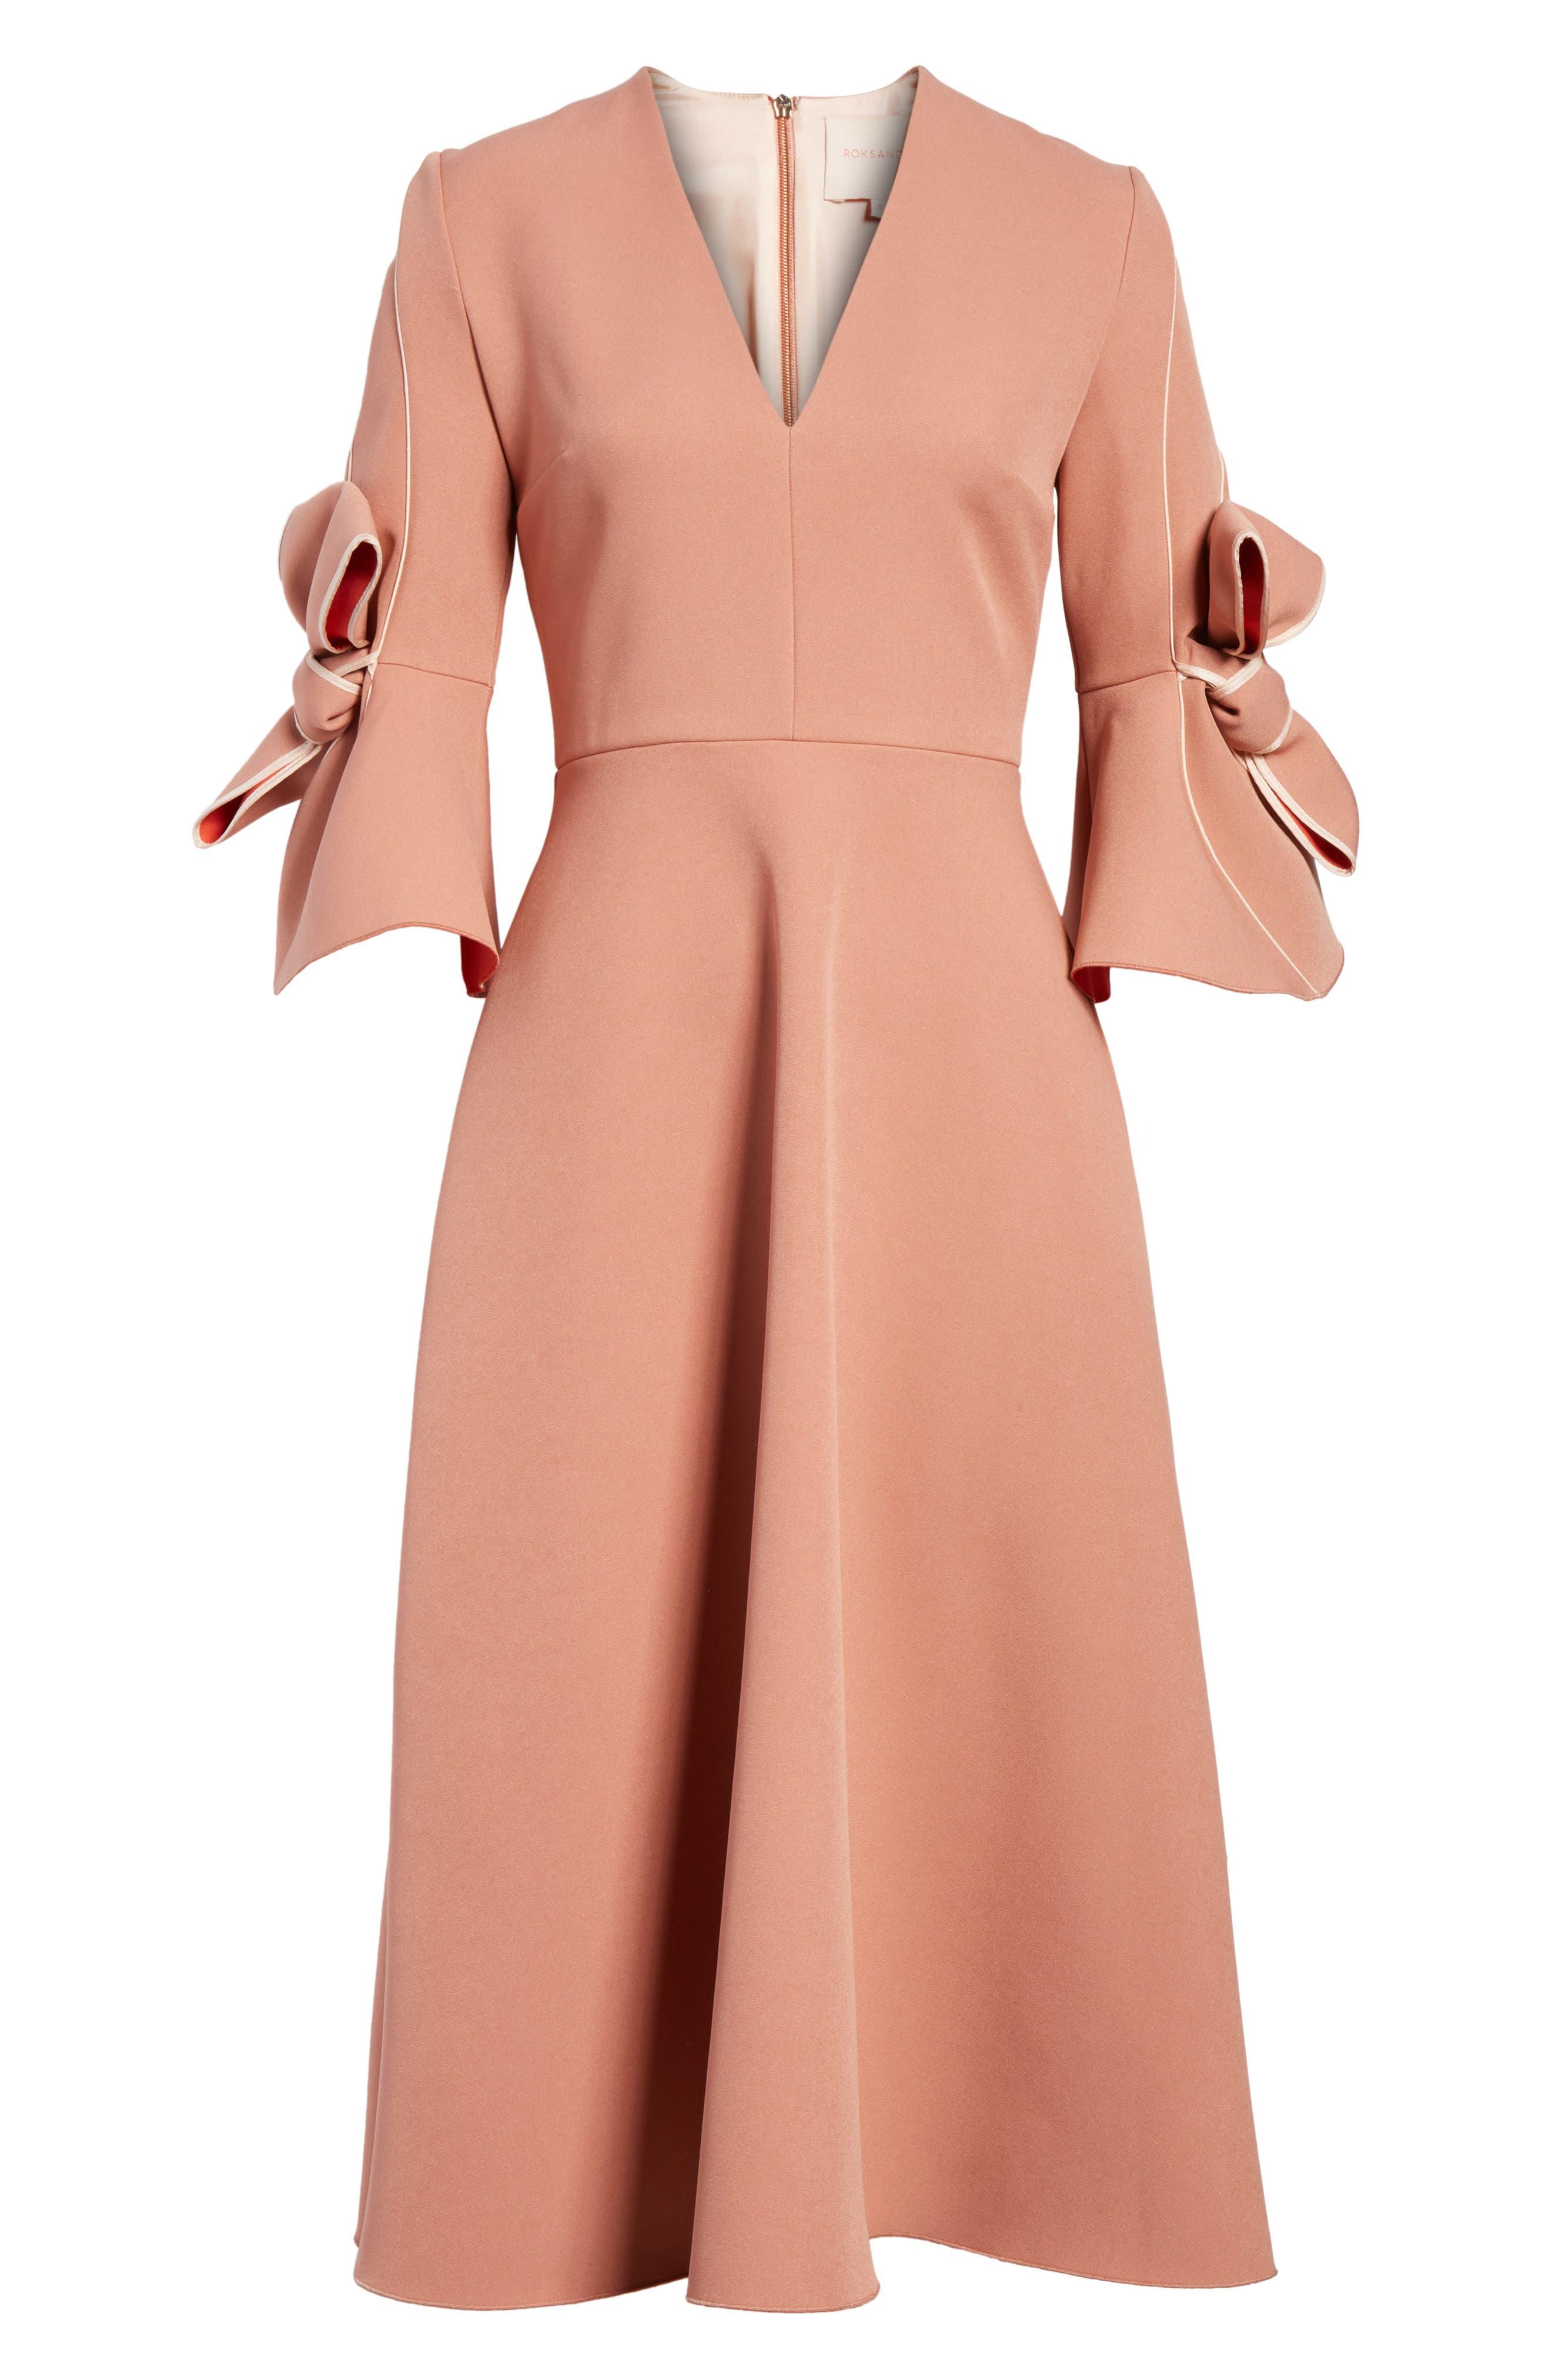 Sibella Bow Trim Dress,                             Alternate thumbnail 6, color,                             950